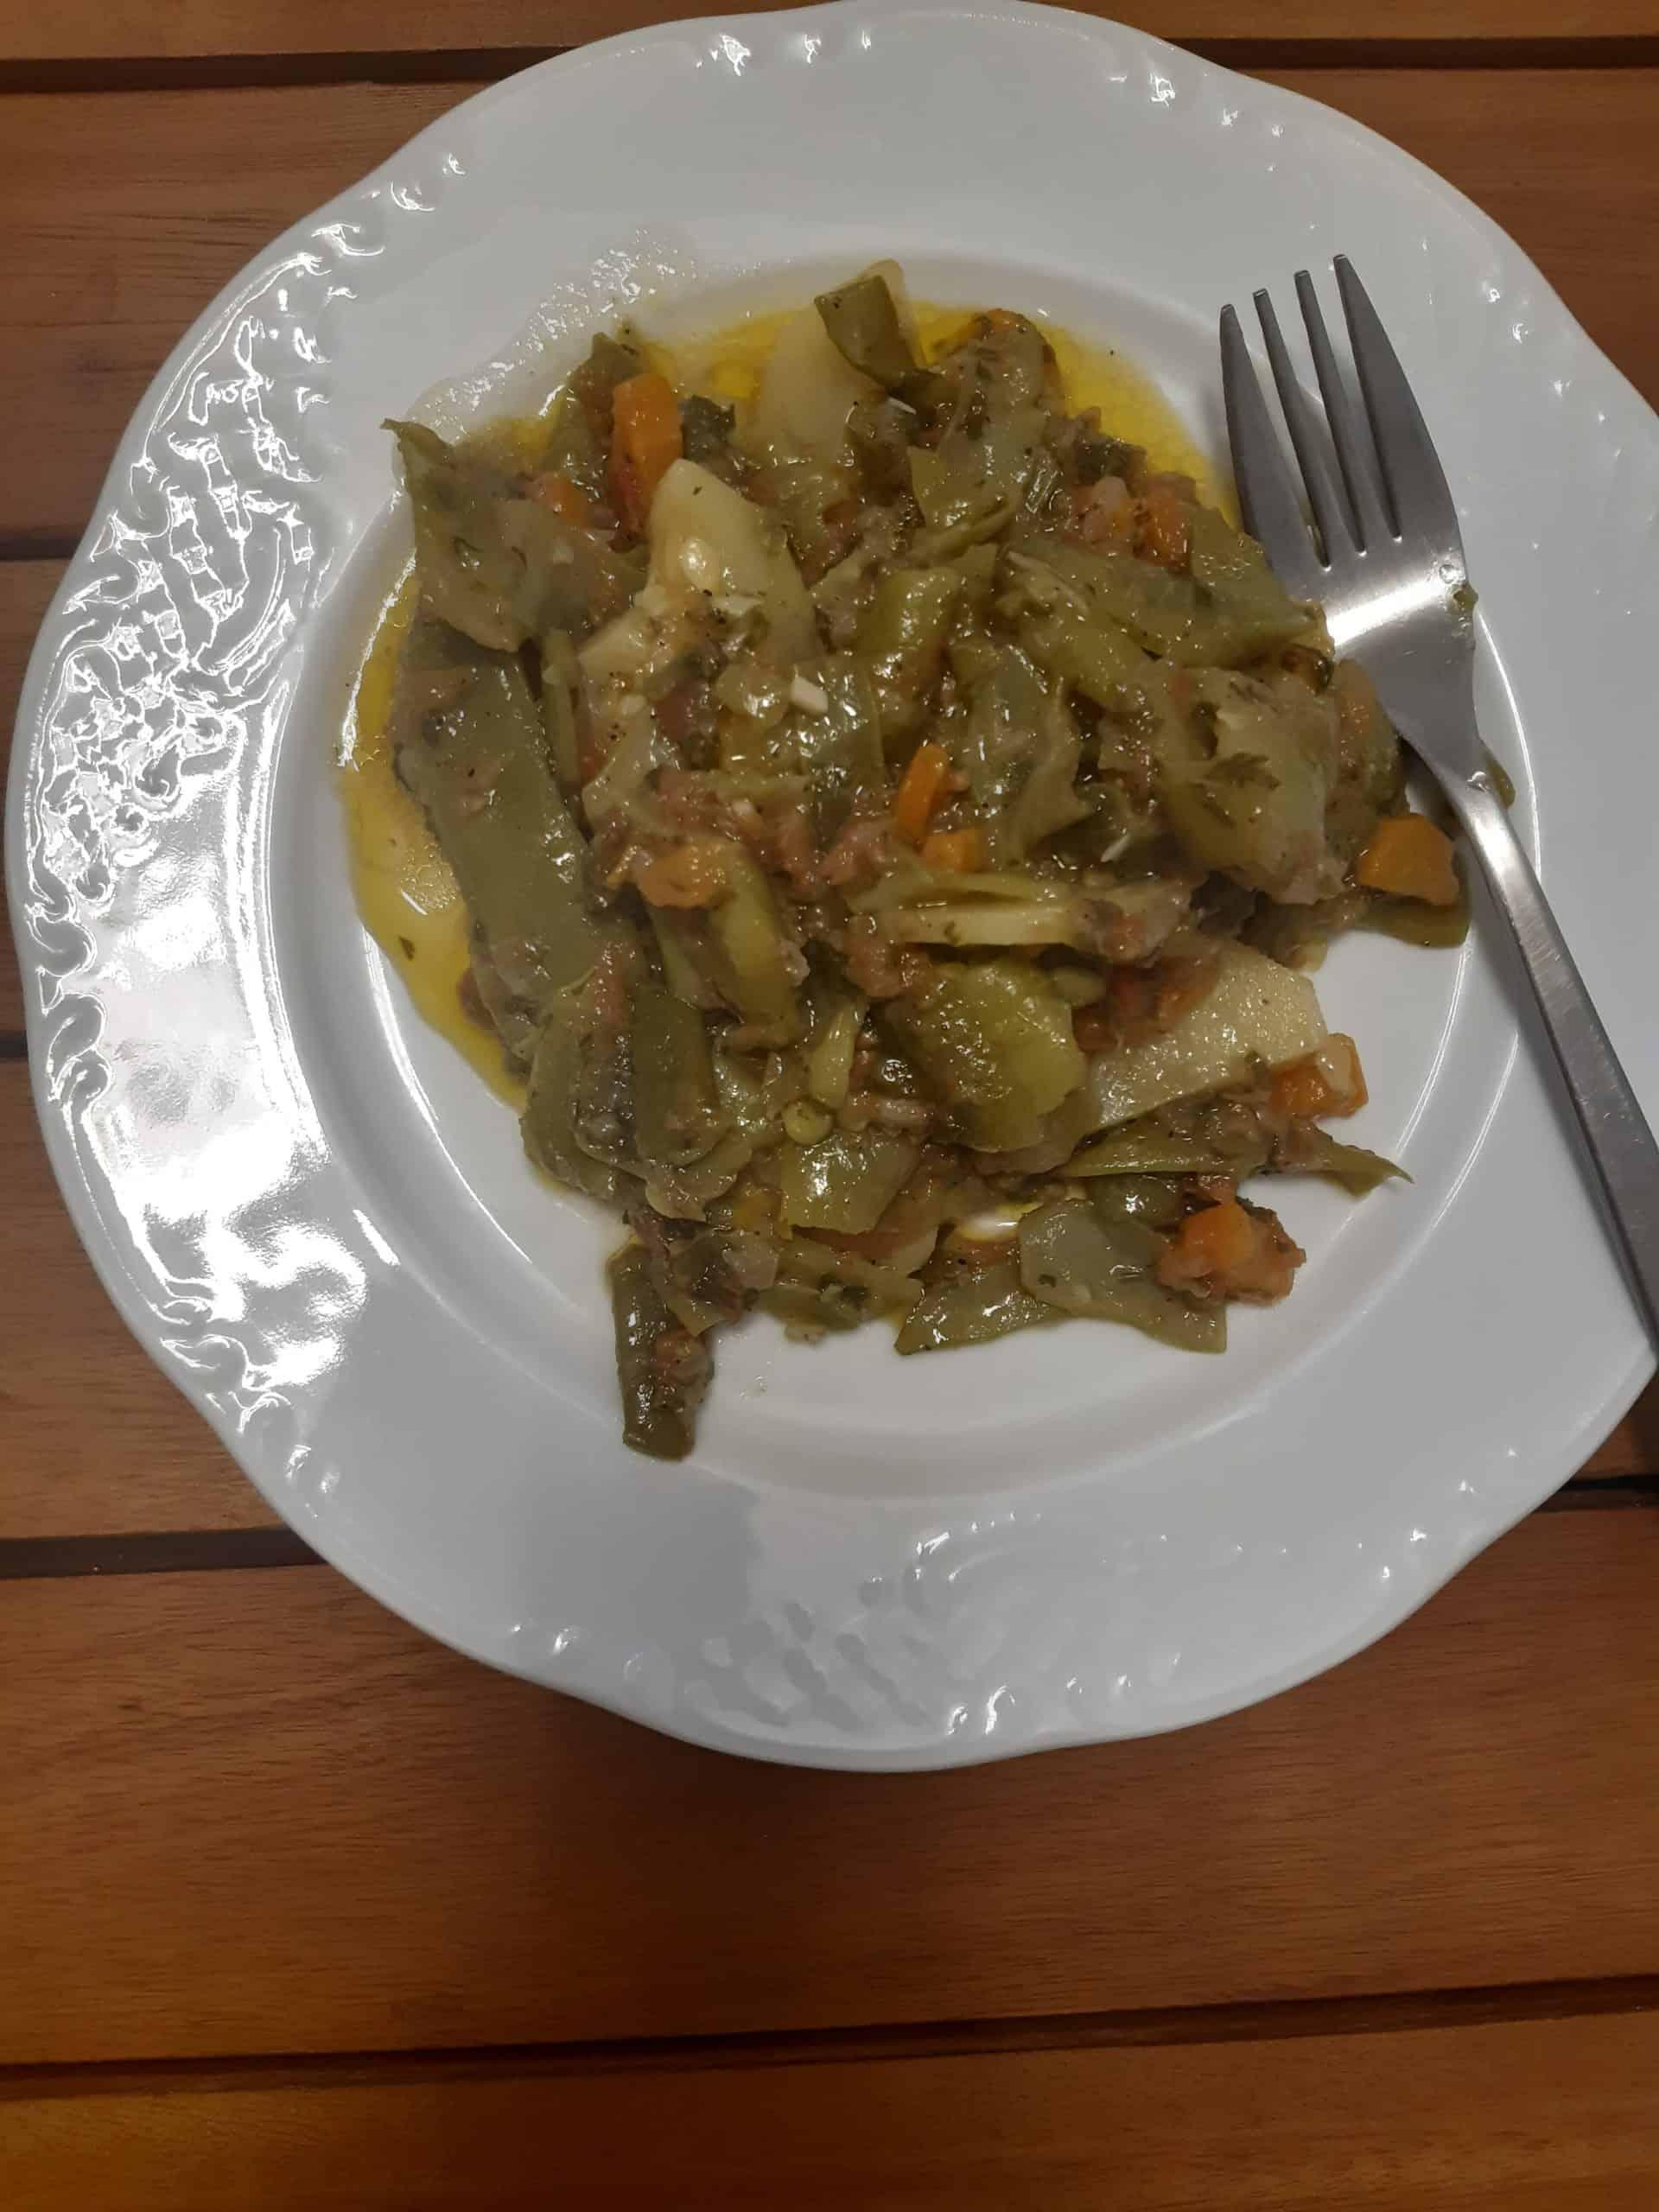 Greek Food: Fasolakia